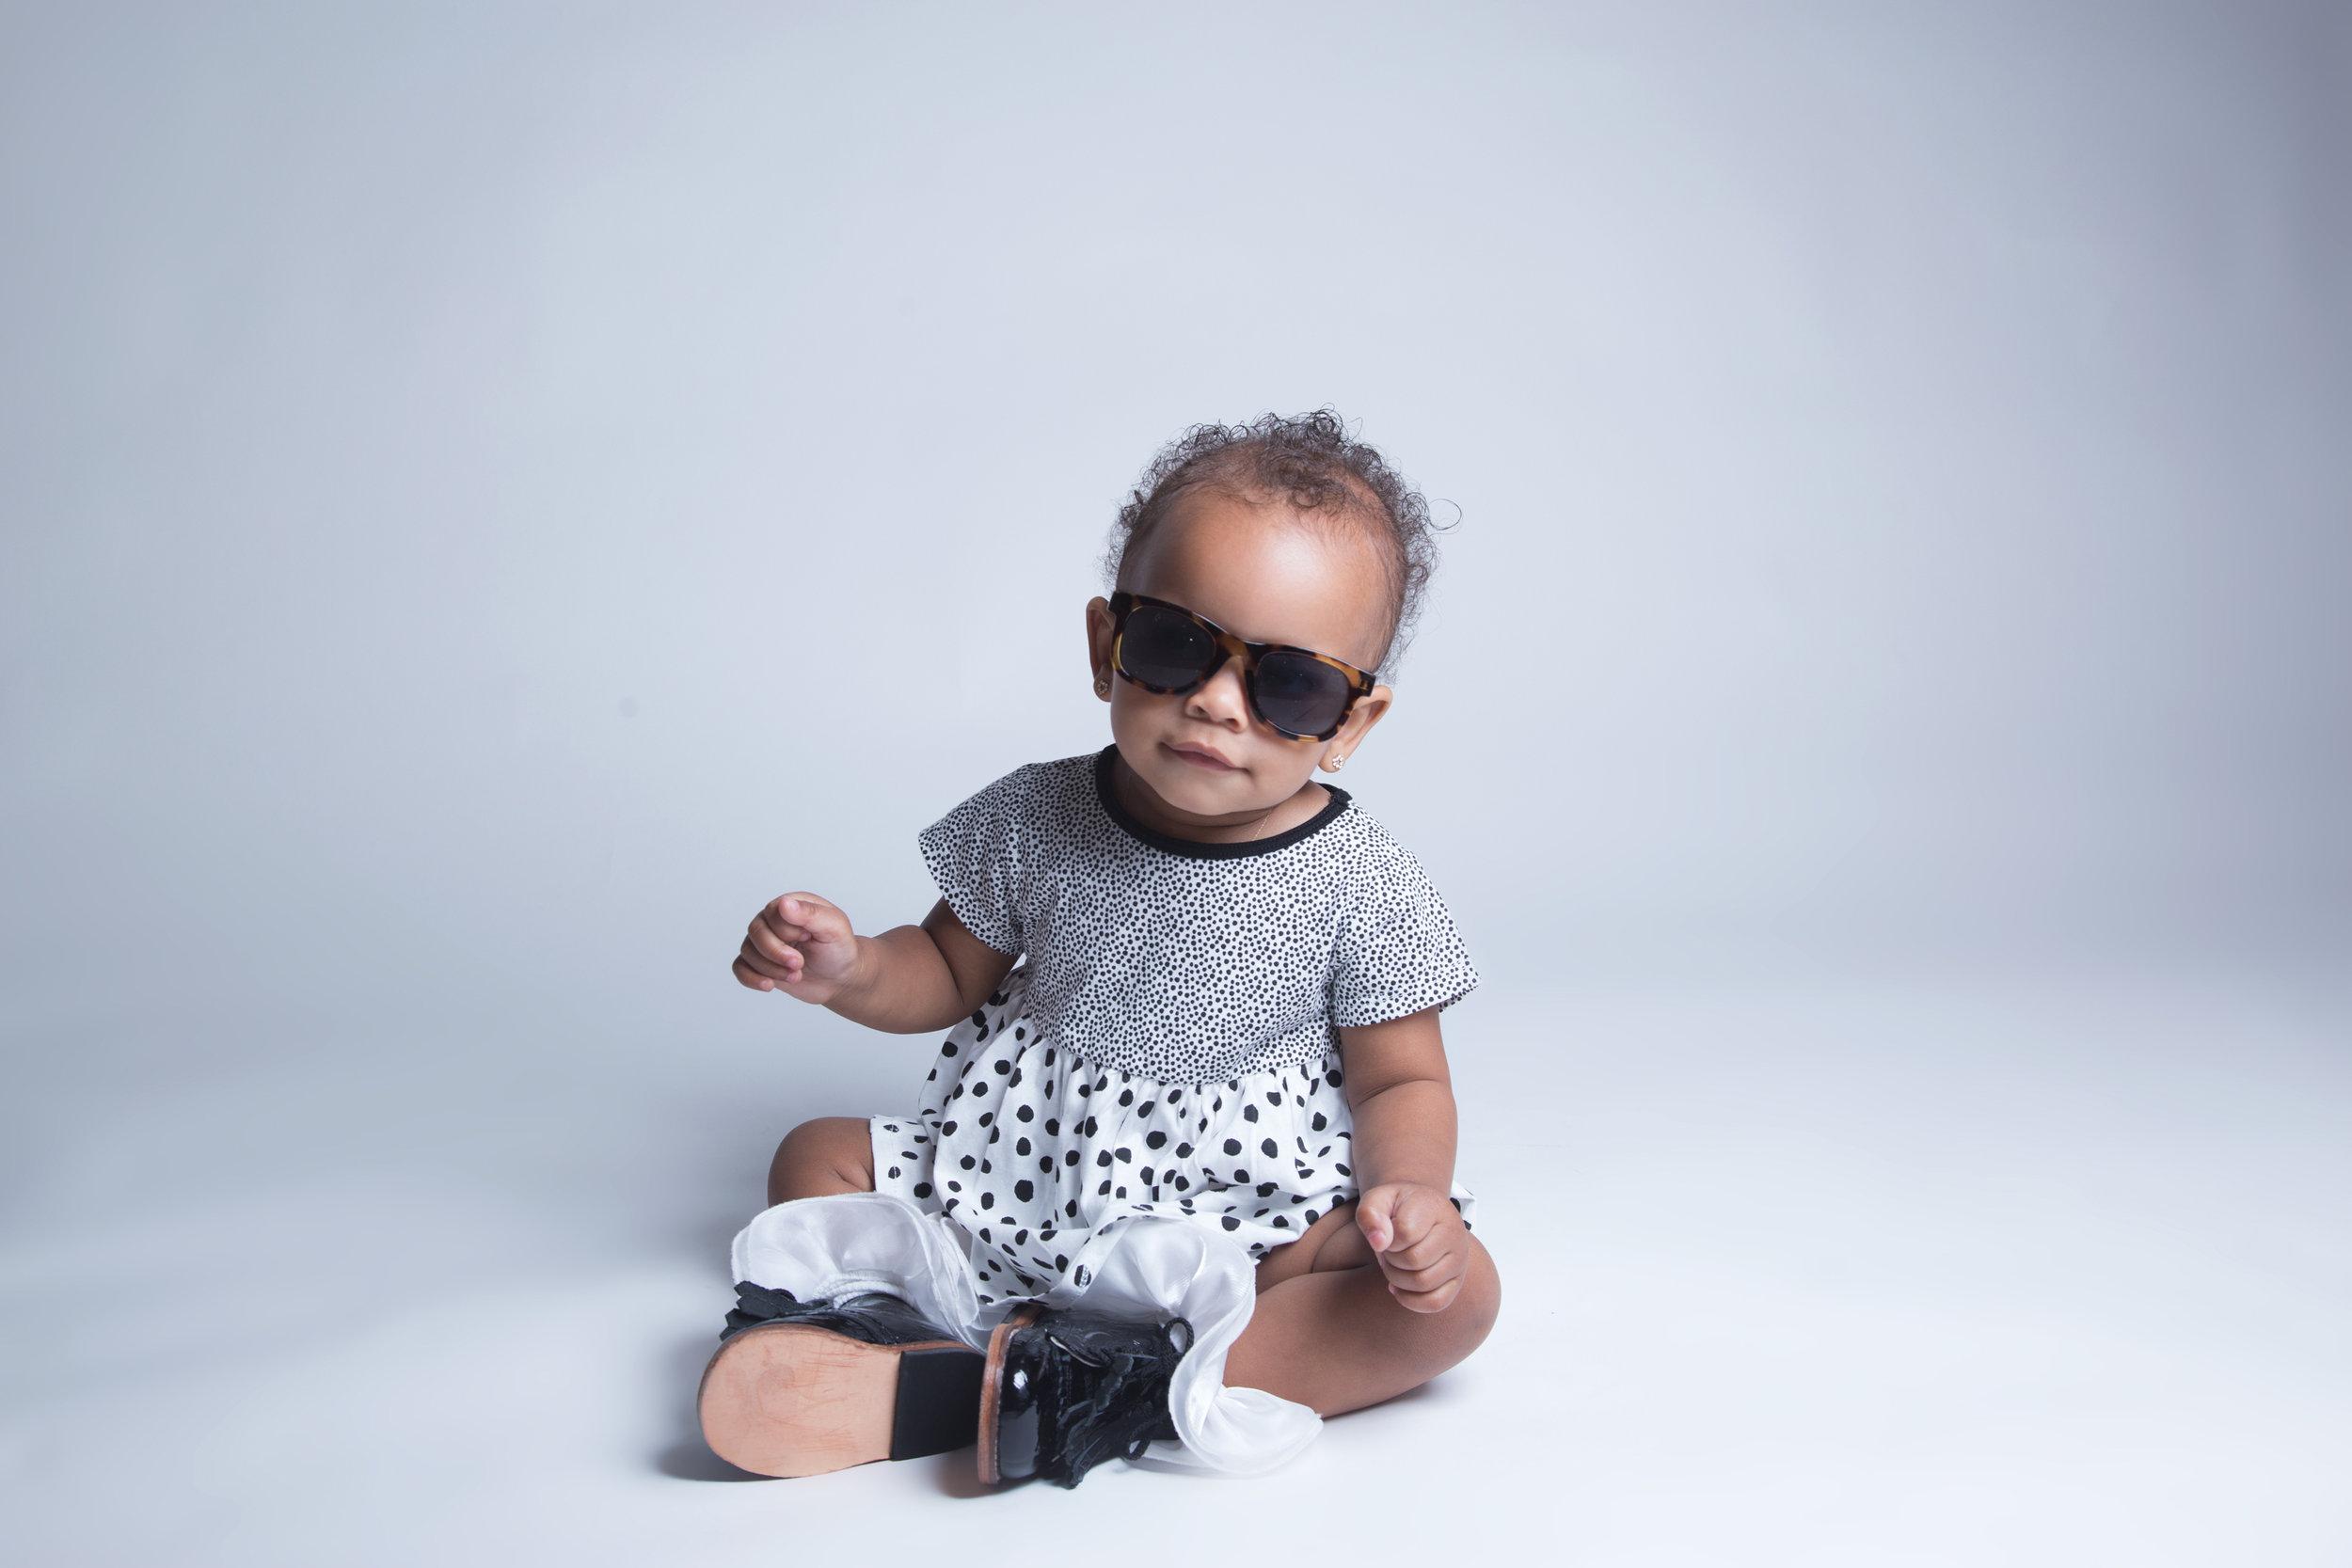 baby-photo-shoot-chamber-photography-antoine-hart-3.jpg